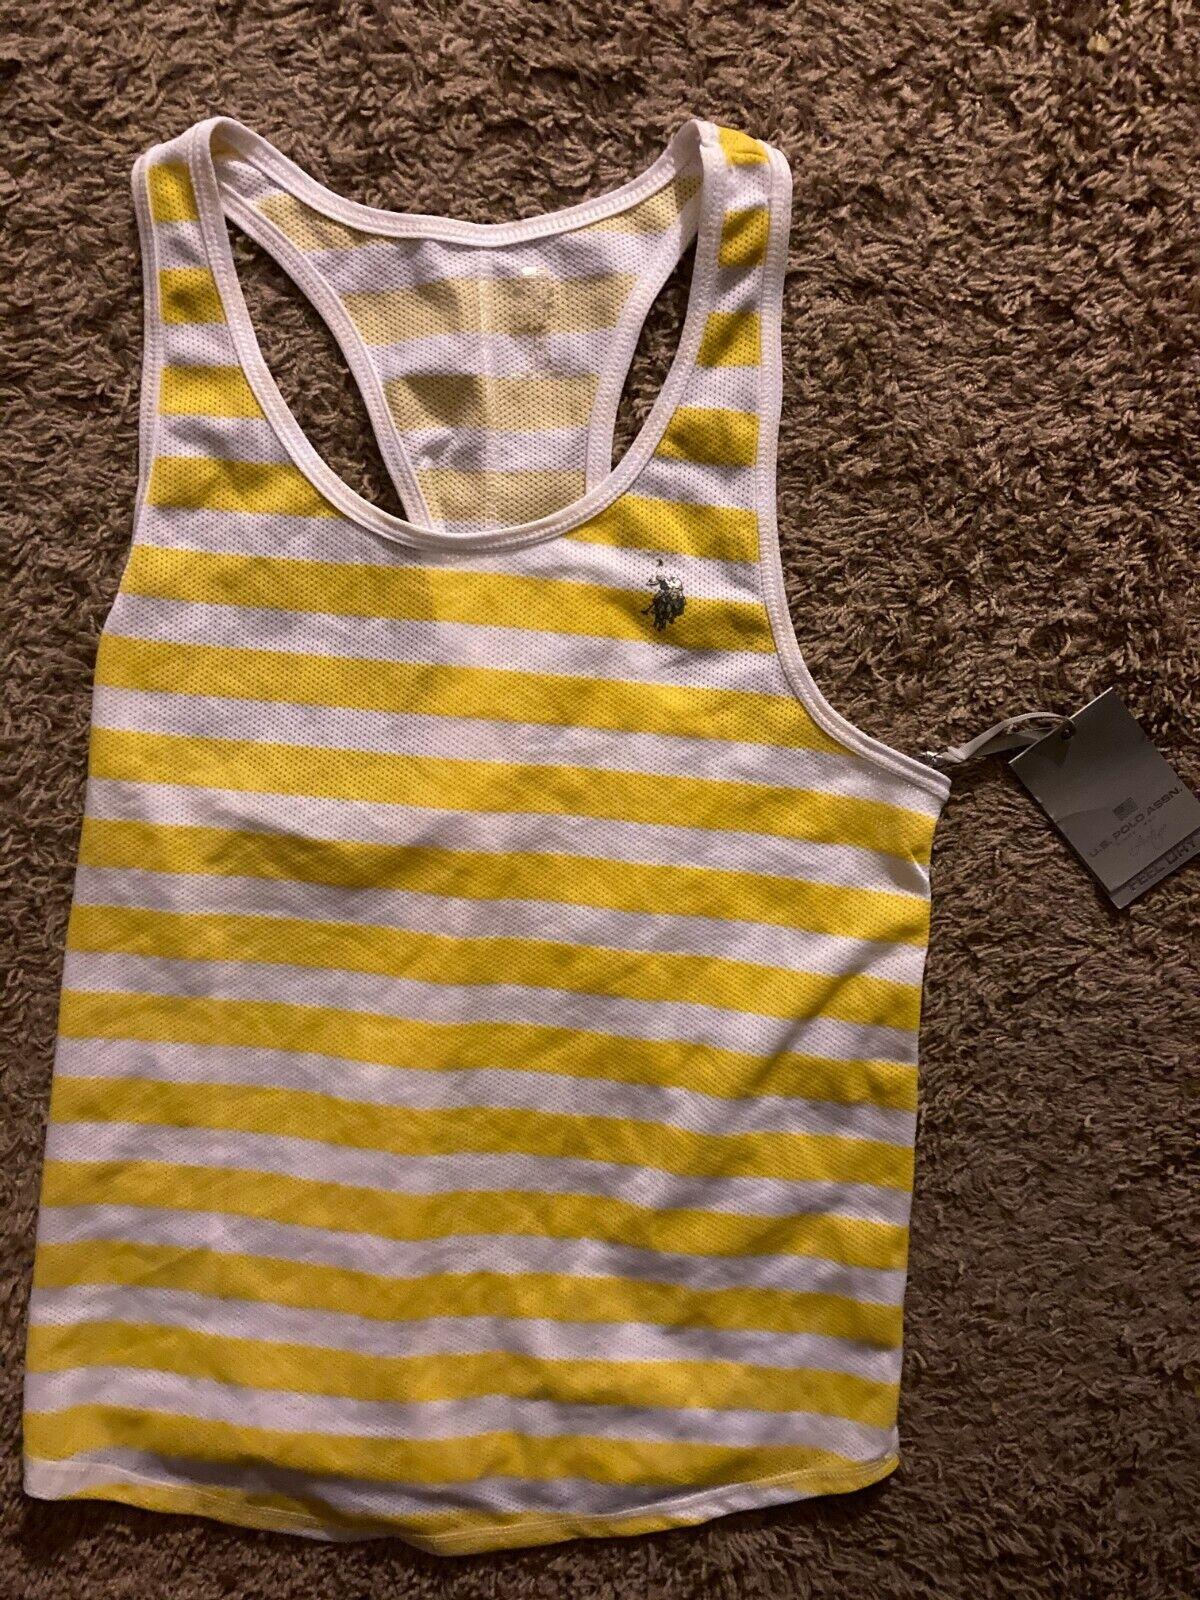 U.S. Polo Assn- Women's Athletic Tank Top, Size: X-Large, Yellow & White striped